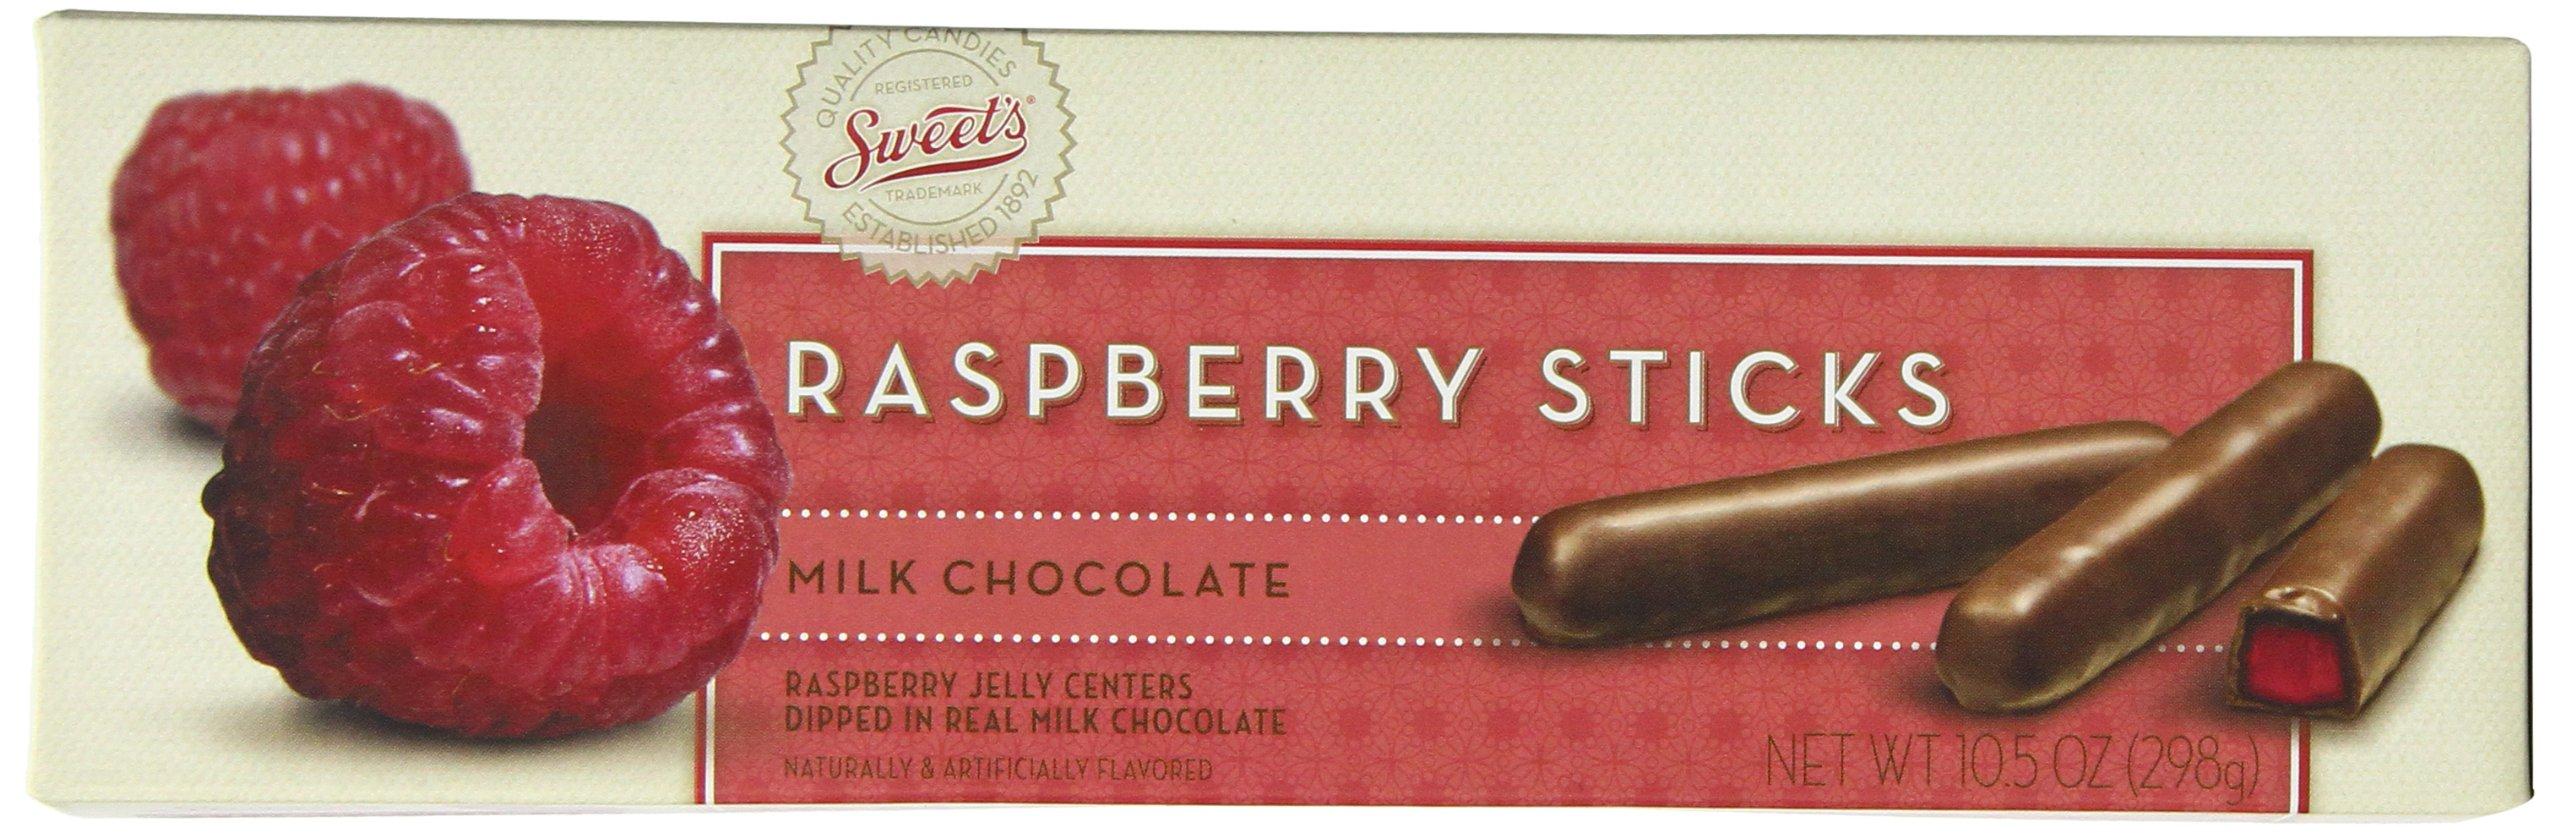 Sweets Candy Milk Chocolate Sticks, Raspberry, 10 Ounce